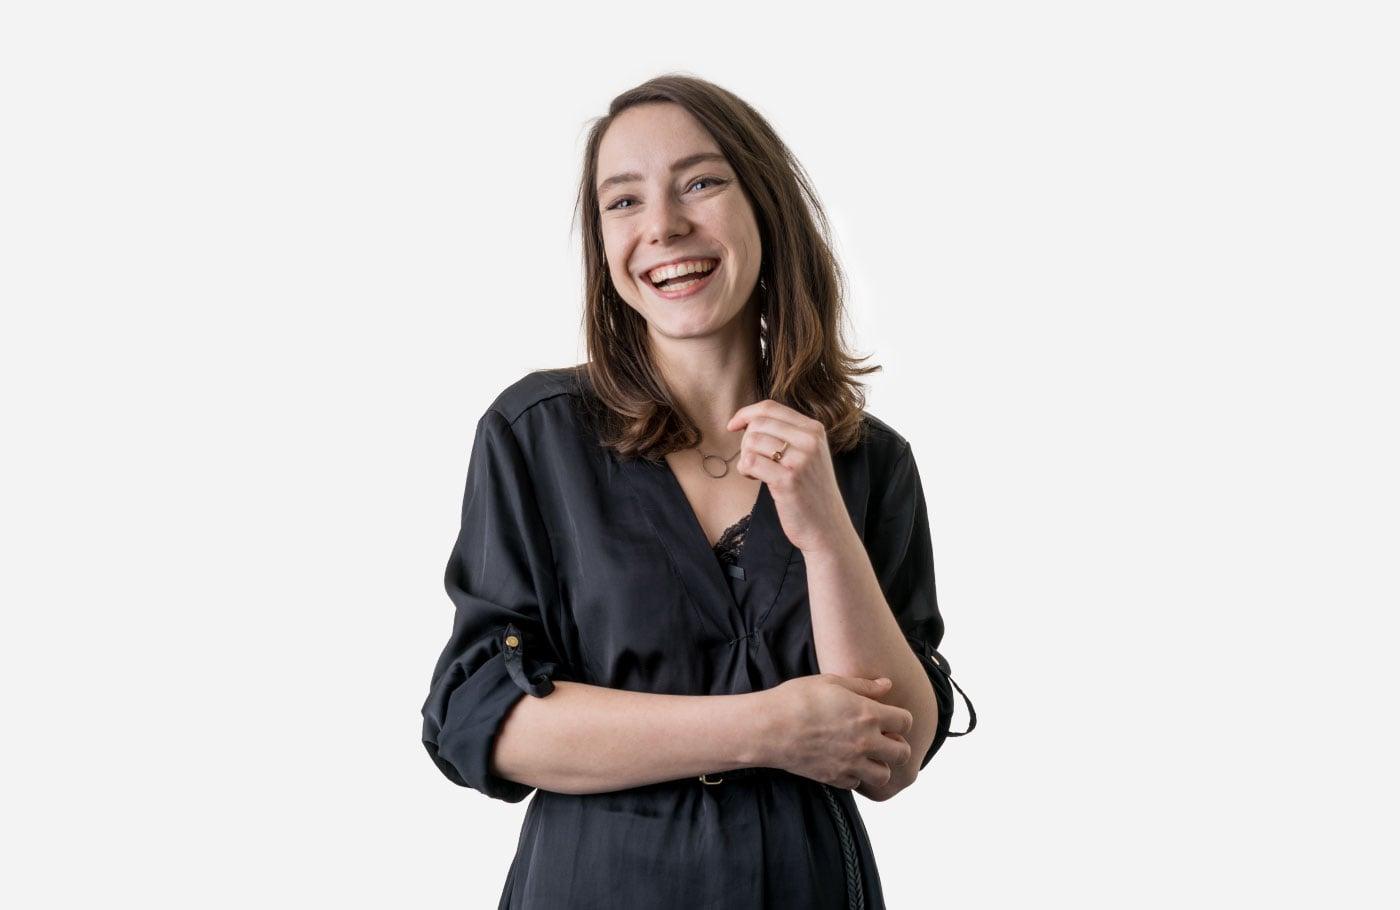 Nicoletta Powroslo